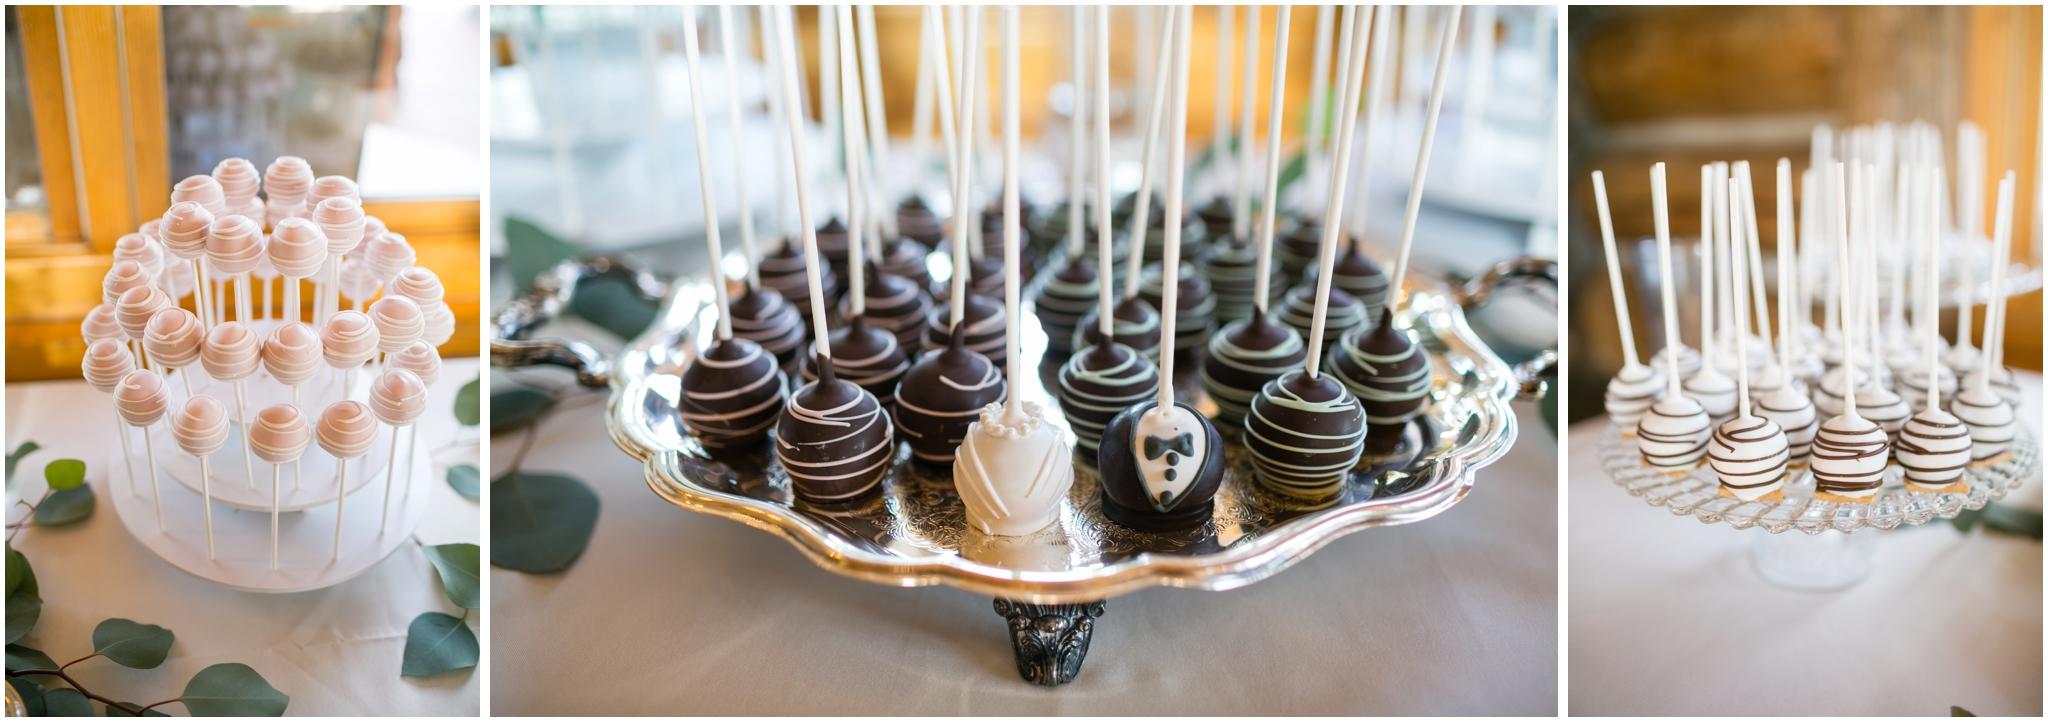 Evergreen_Lake_house_Wedding_Cake_Pops_Ashley_McKenzie_Photography.JPG